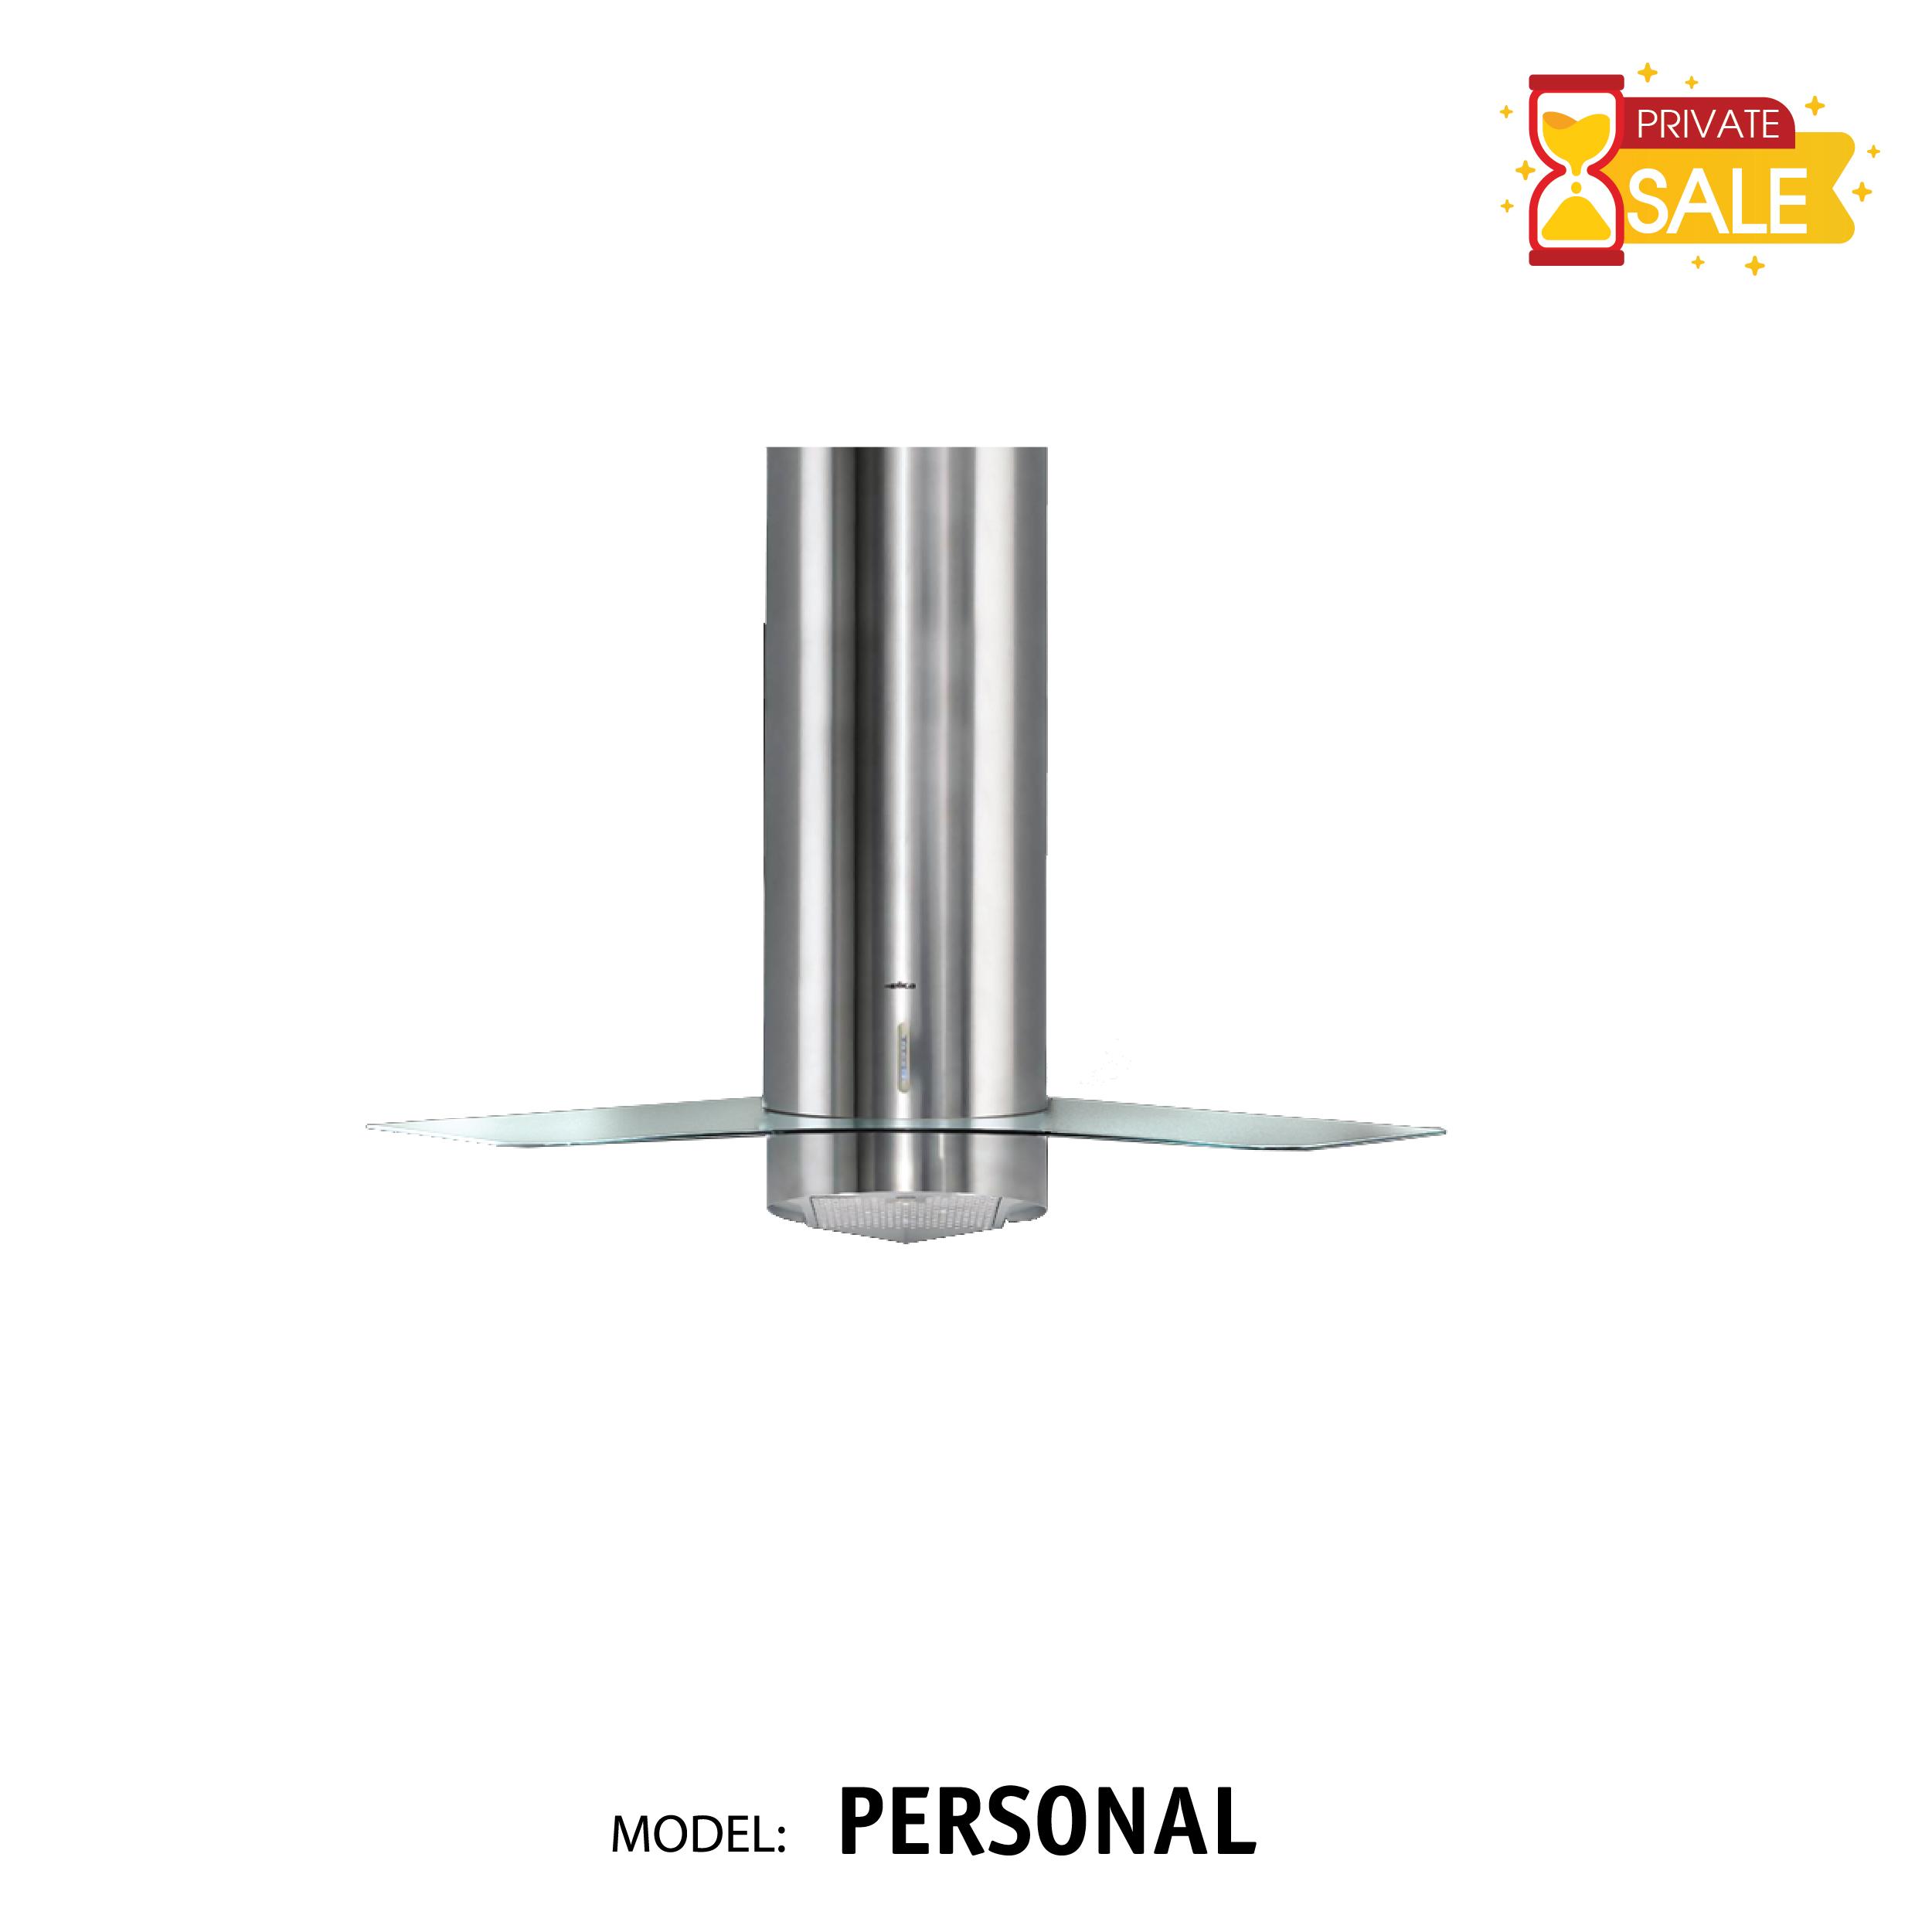 Máy hút mùi đặt góc Elica - Model PERSONAL